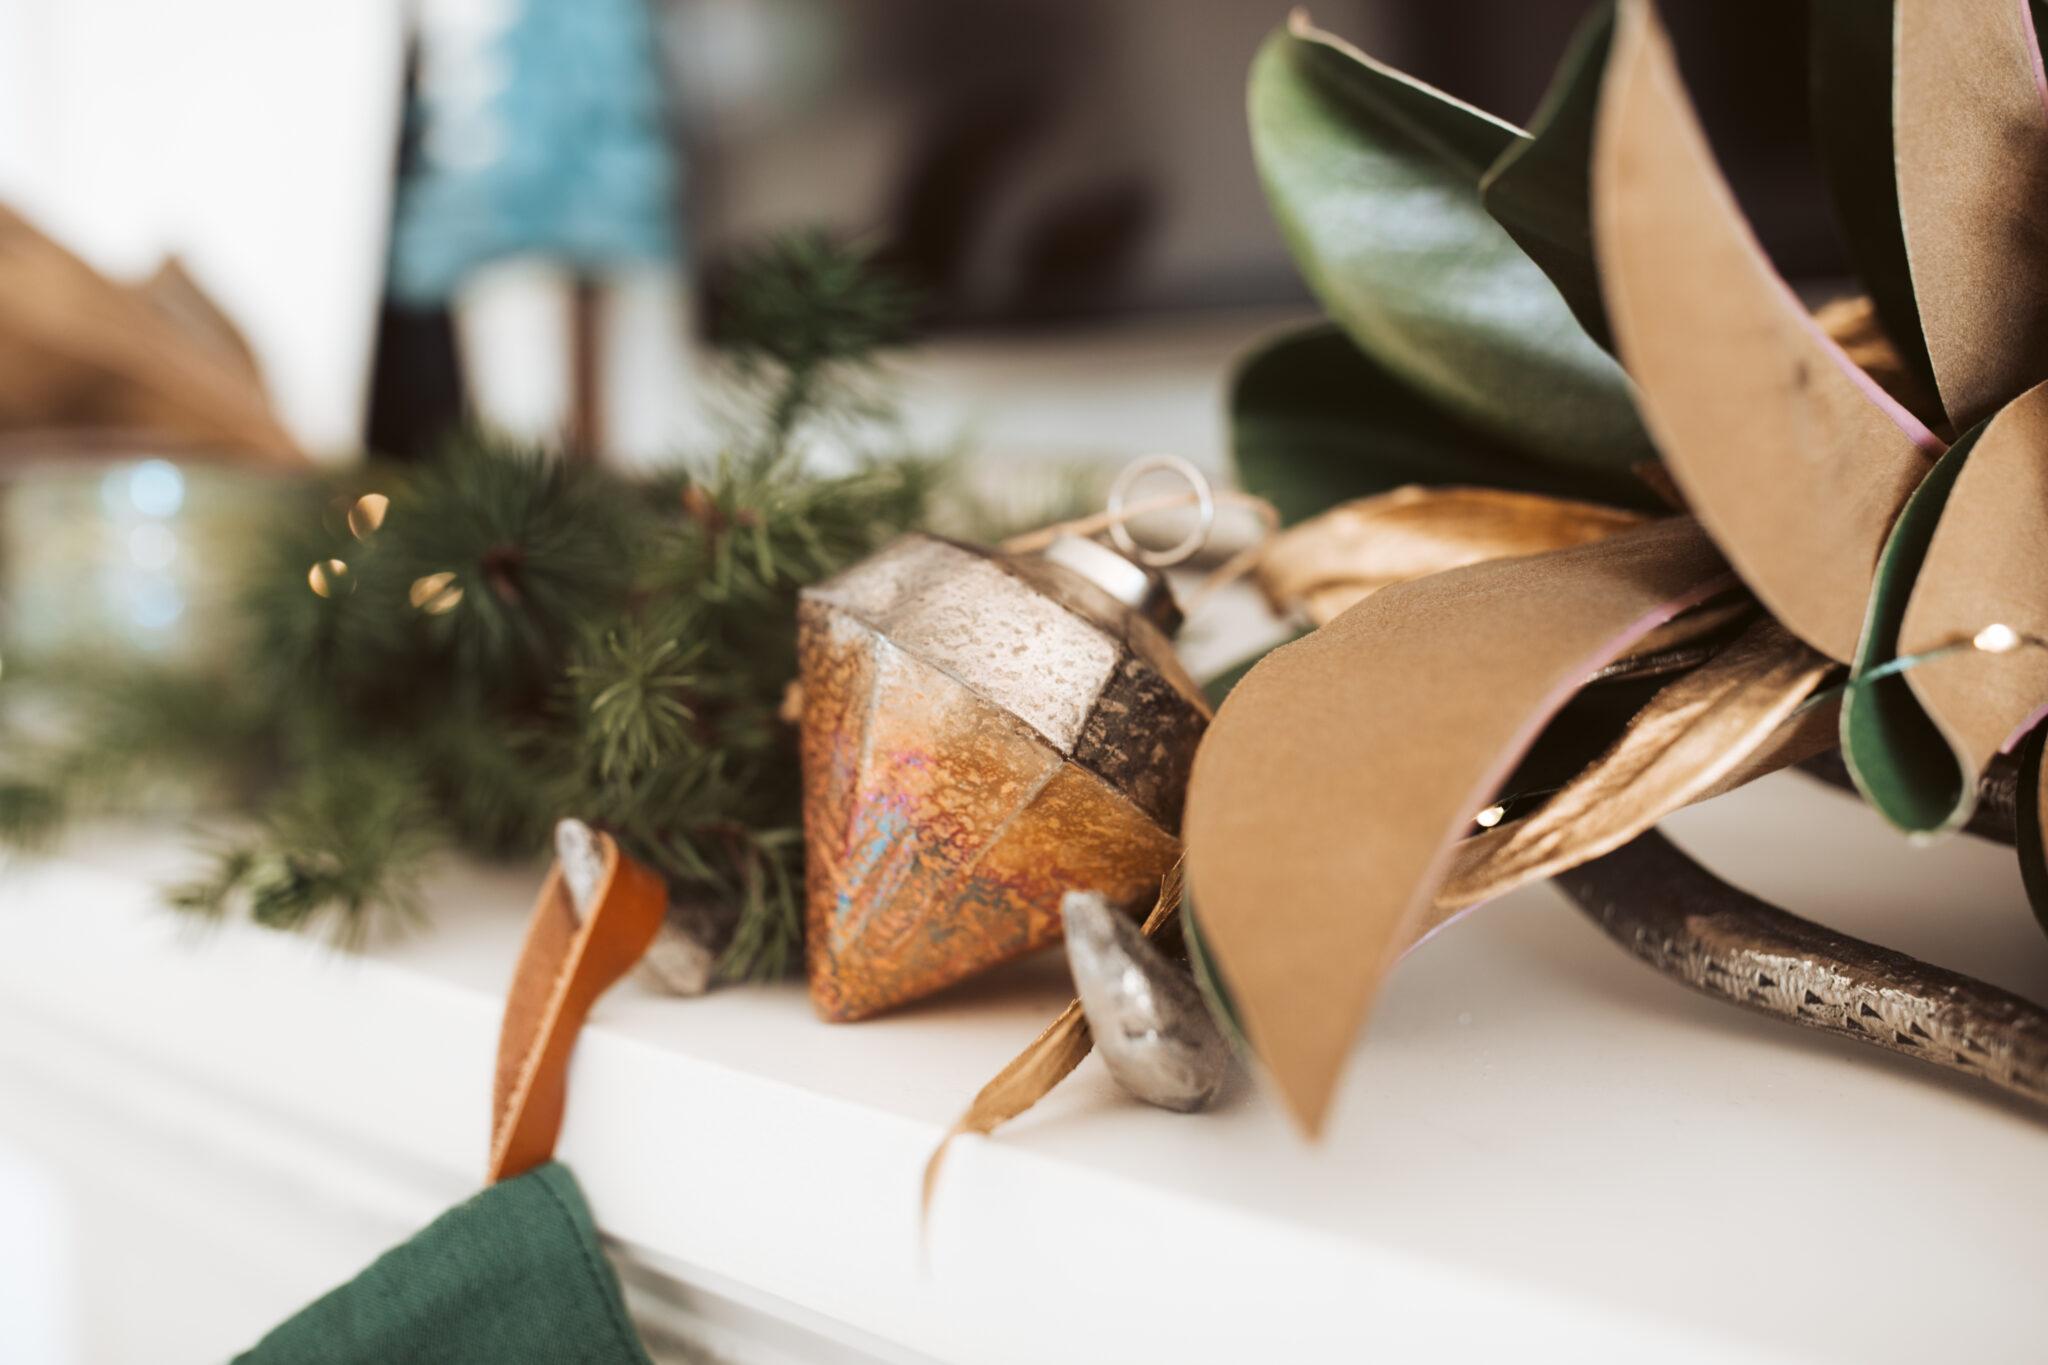 ornaments on a shelf